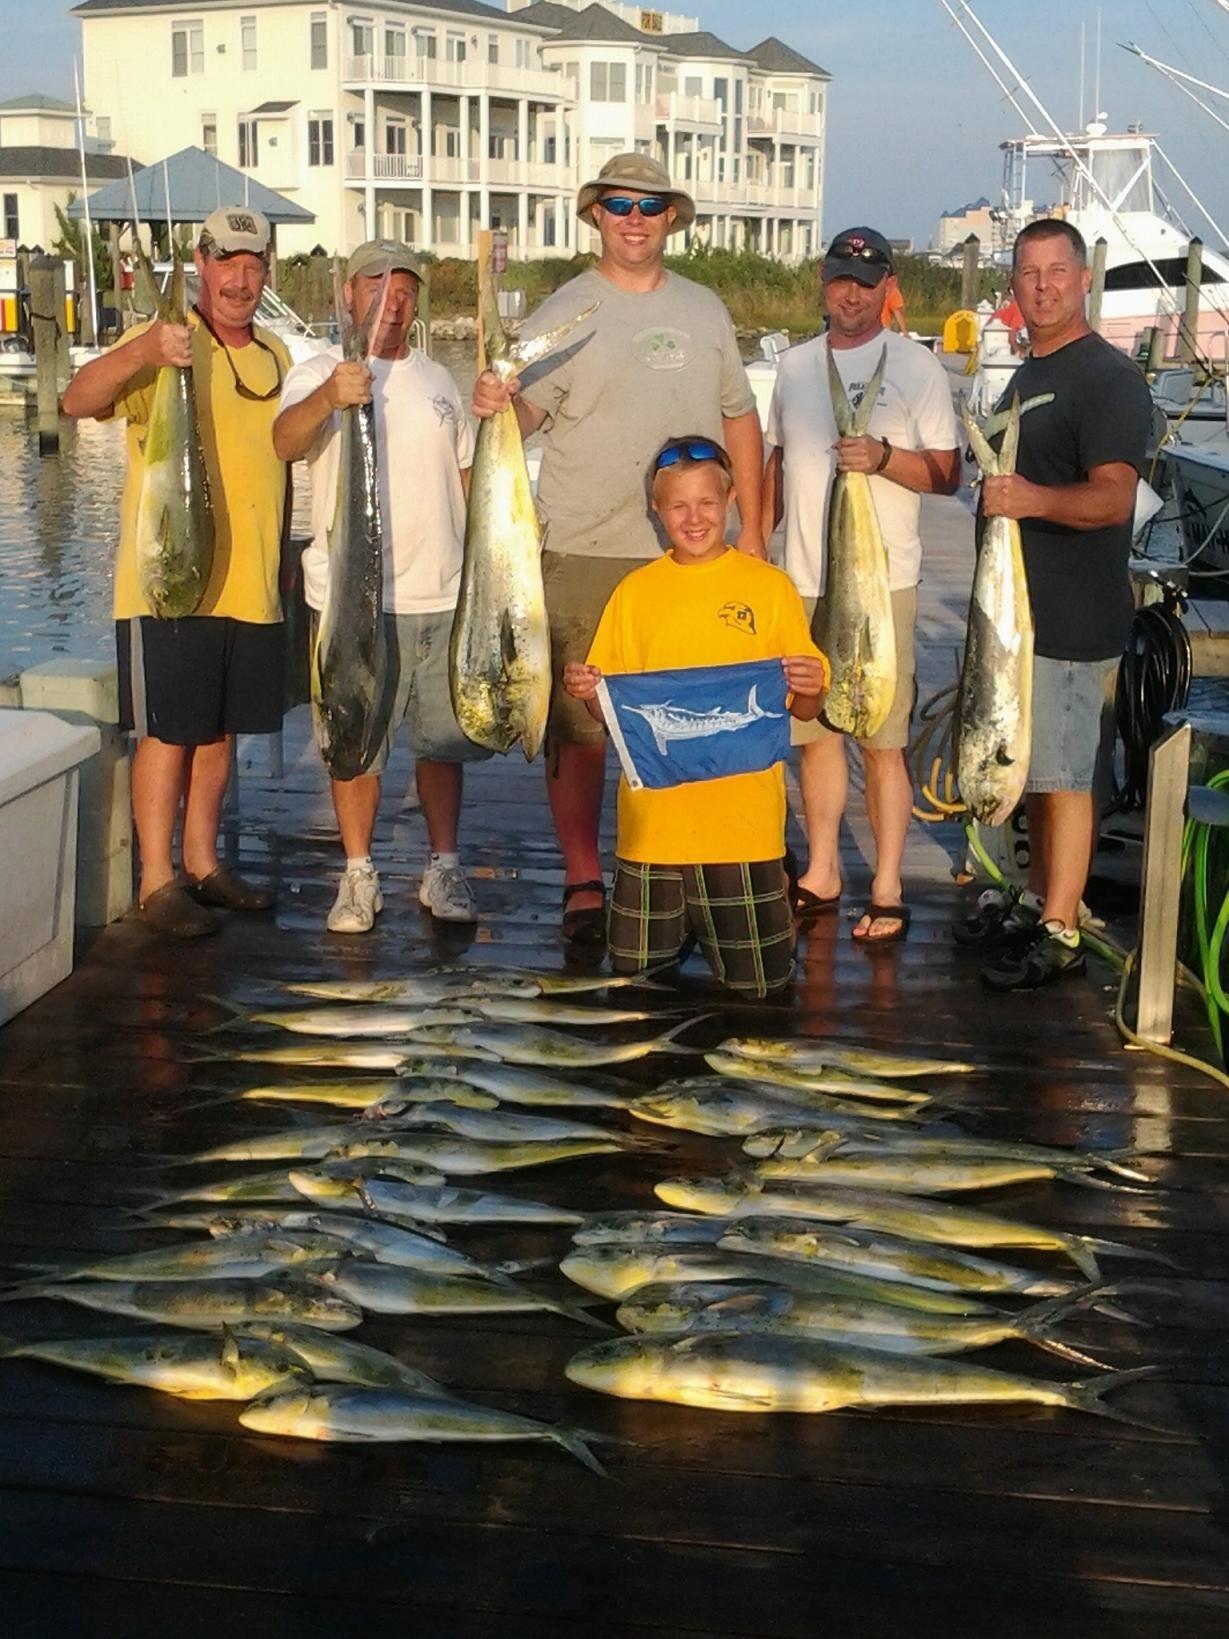 Foolish Pleasures Big Game Fishing: OC Full Day Offshore Charter